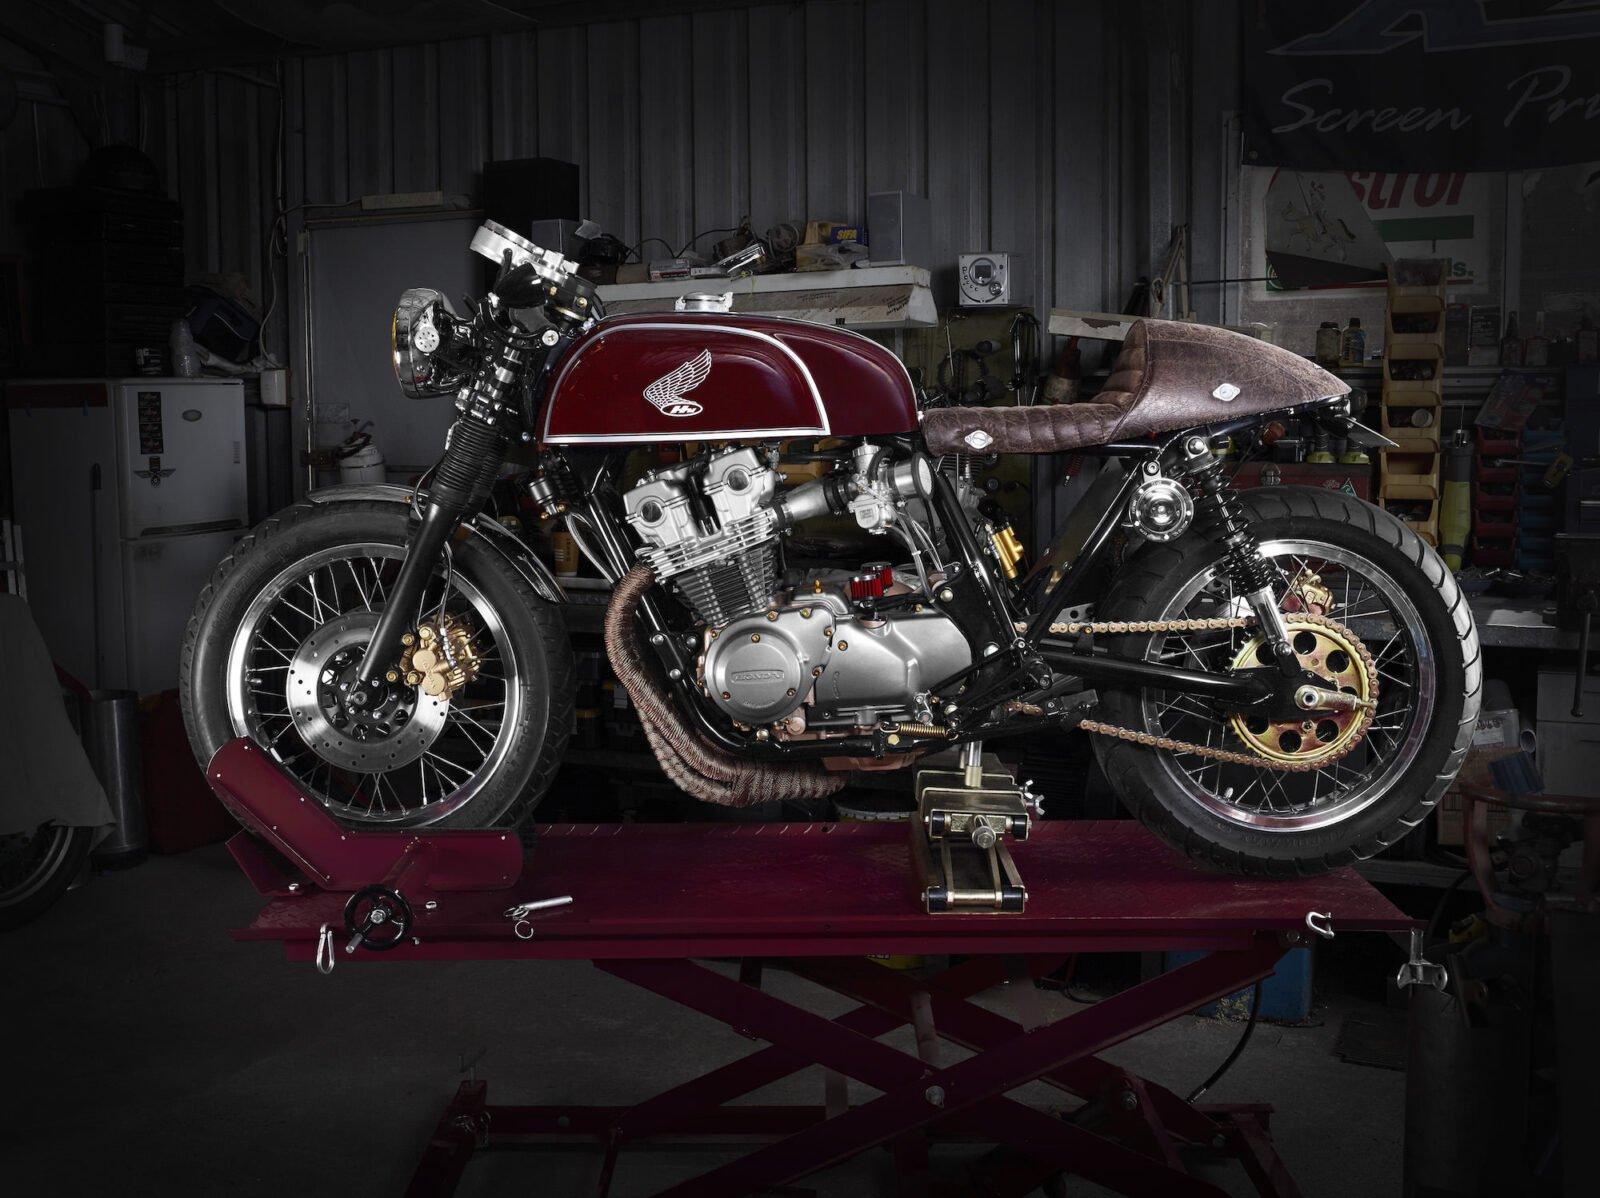 scott67537.ret3  1600x1198 - Honda CB900F Bol d'Or